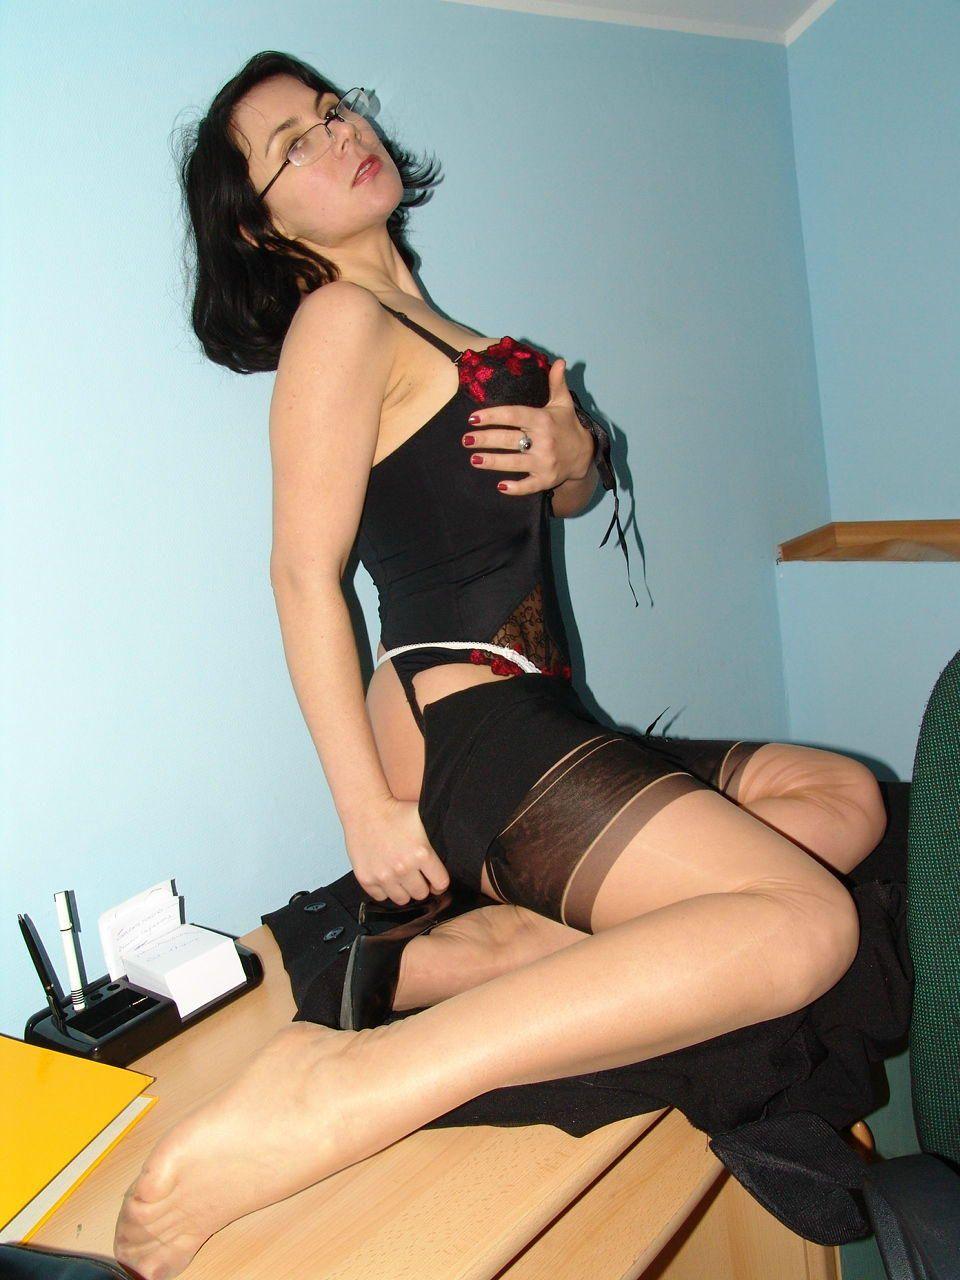 fuck mature sluts — http://fuckmatureslut.tumblr/ | image